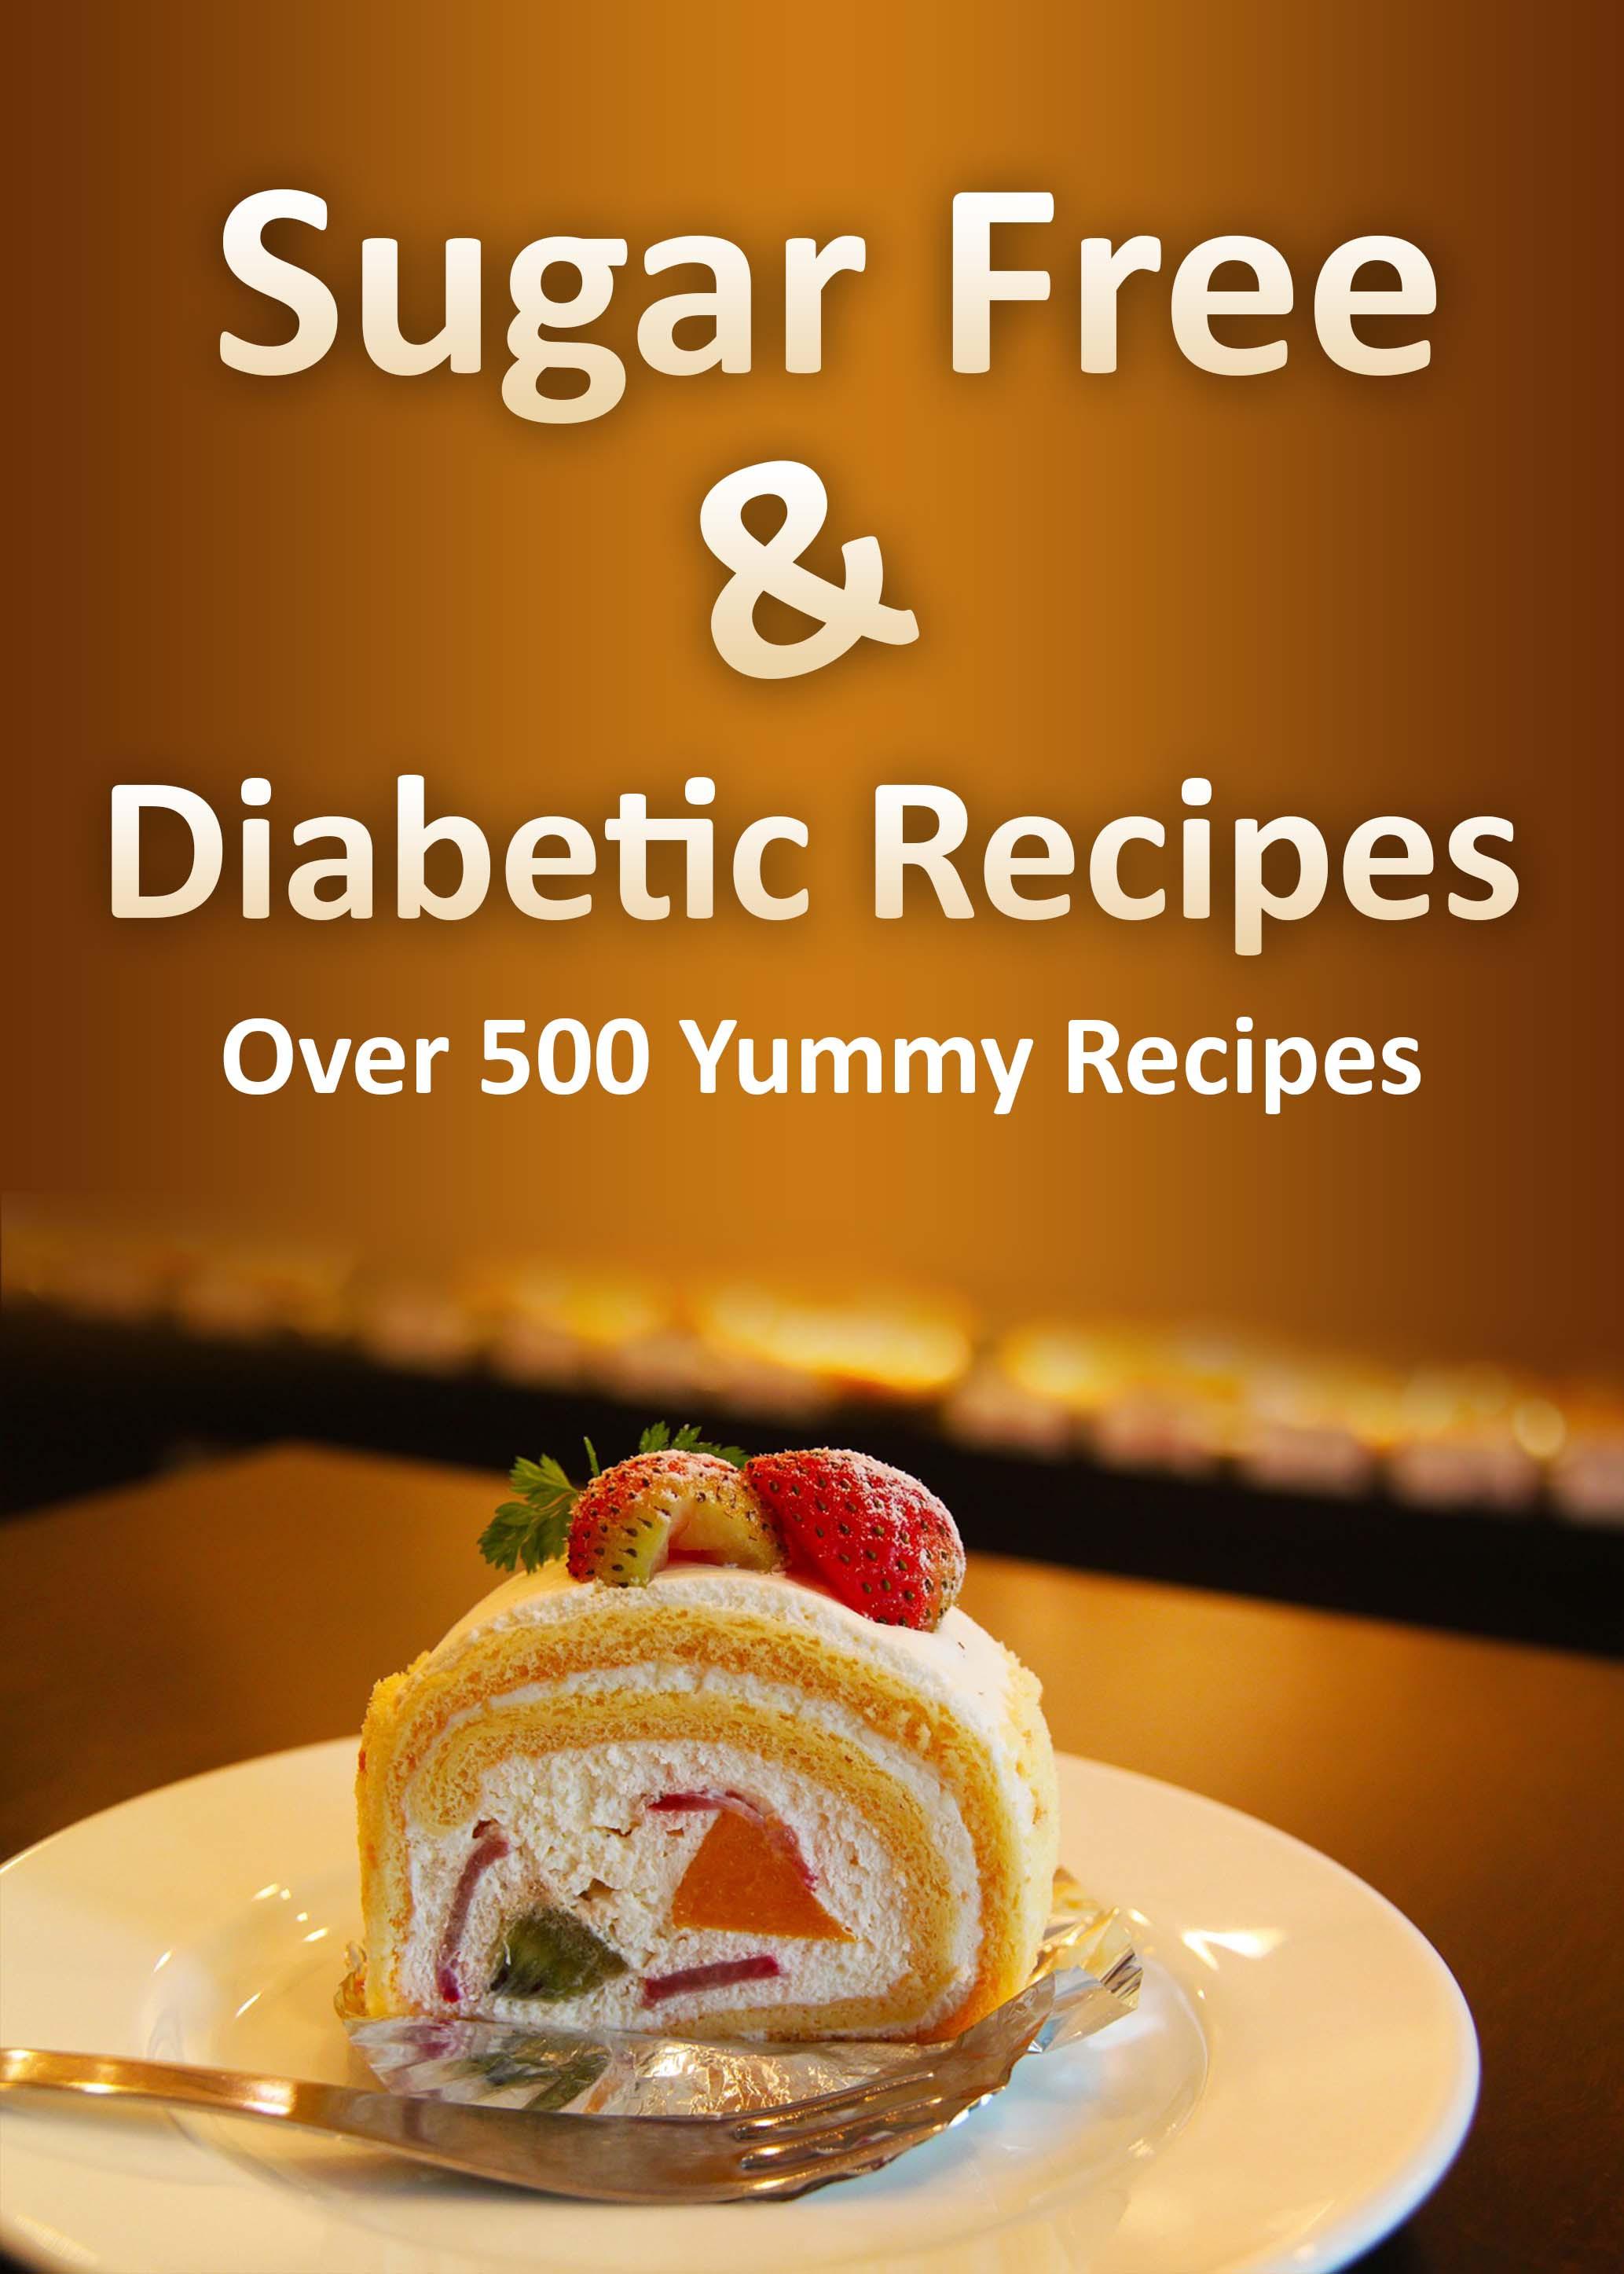 American Diabetic Recipes  500 Sugar Free Diabetic Recipes